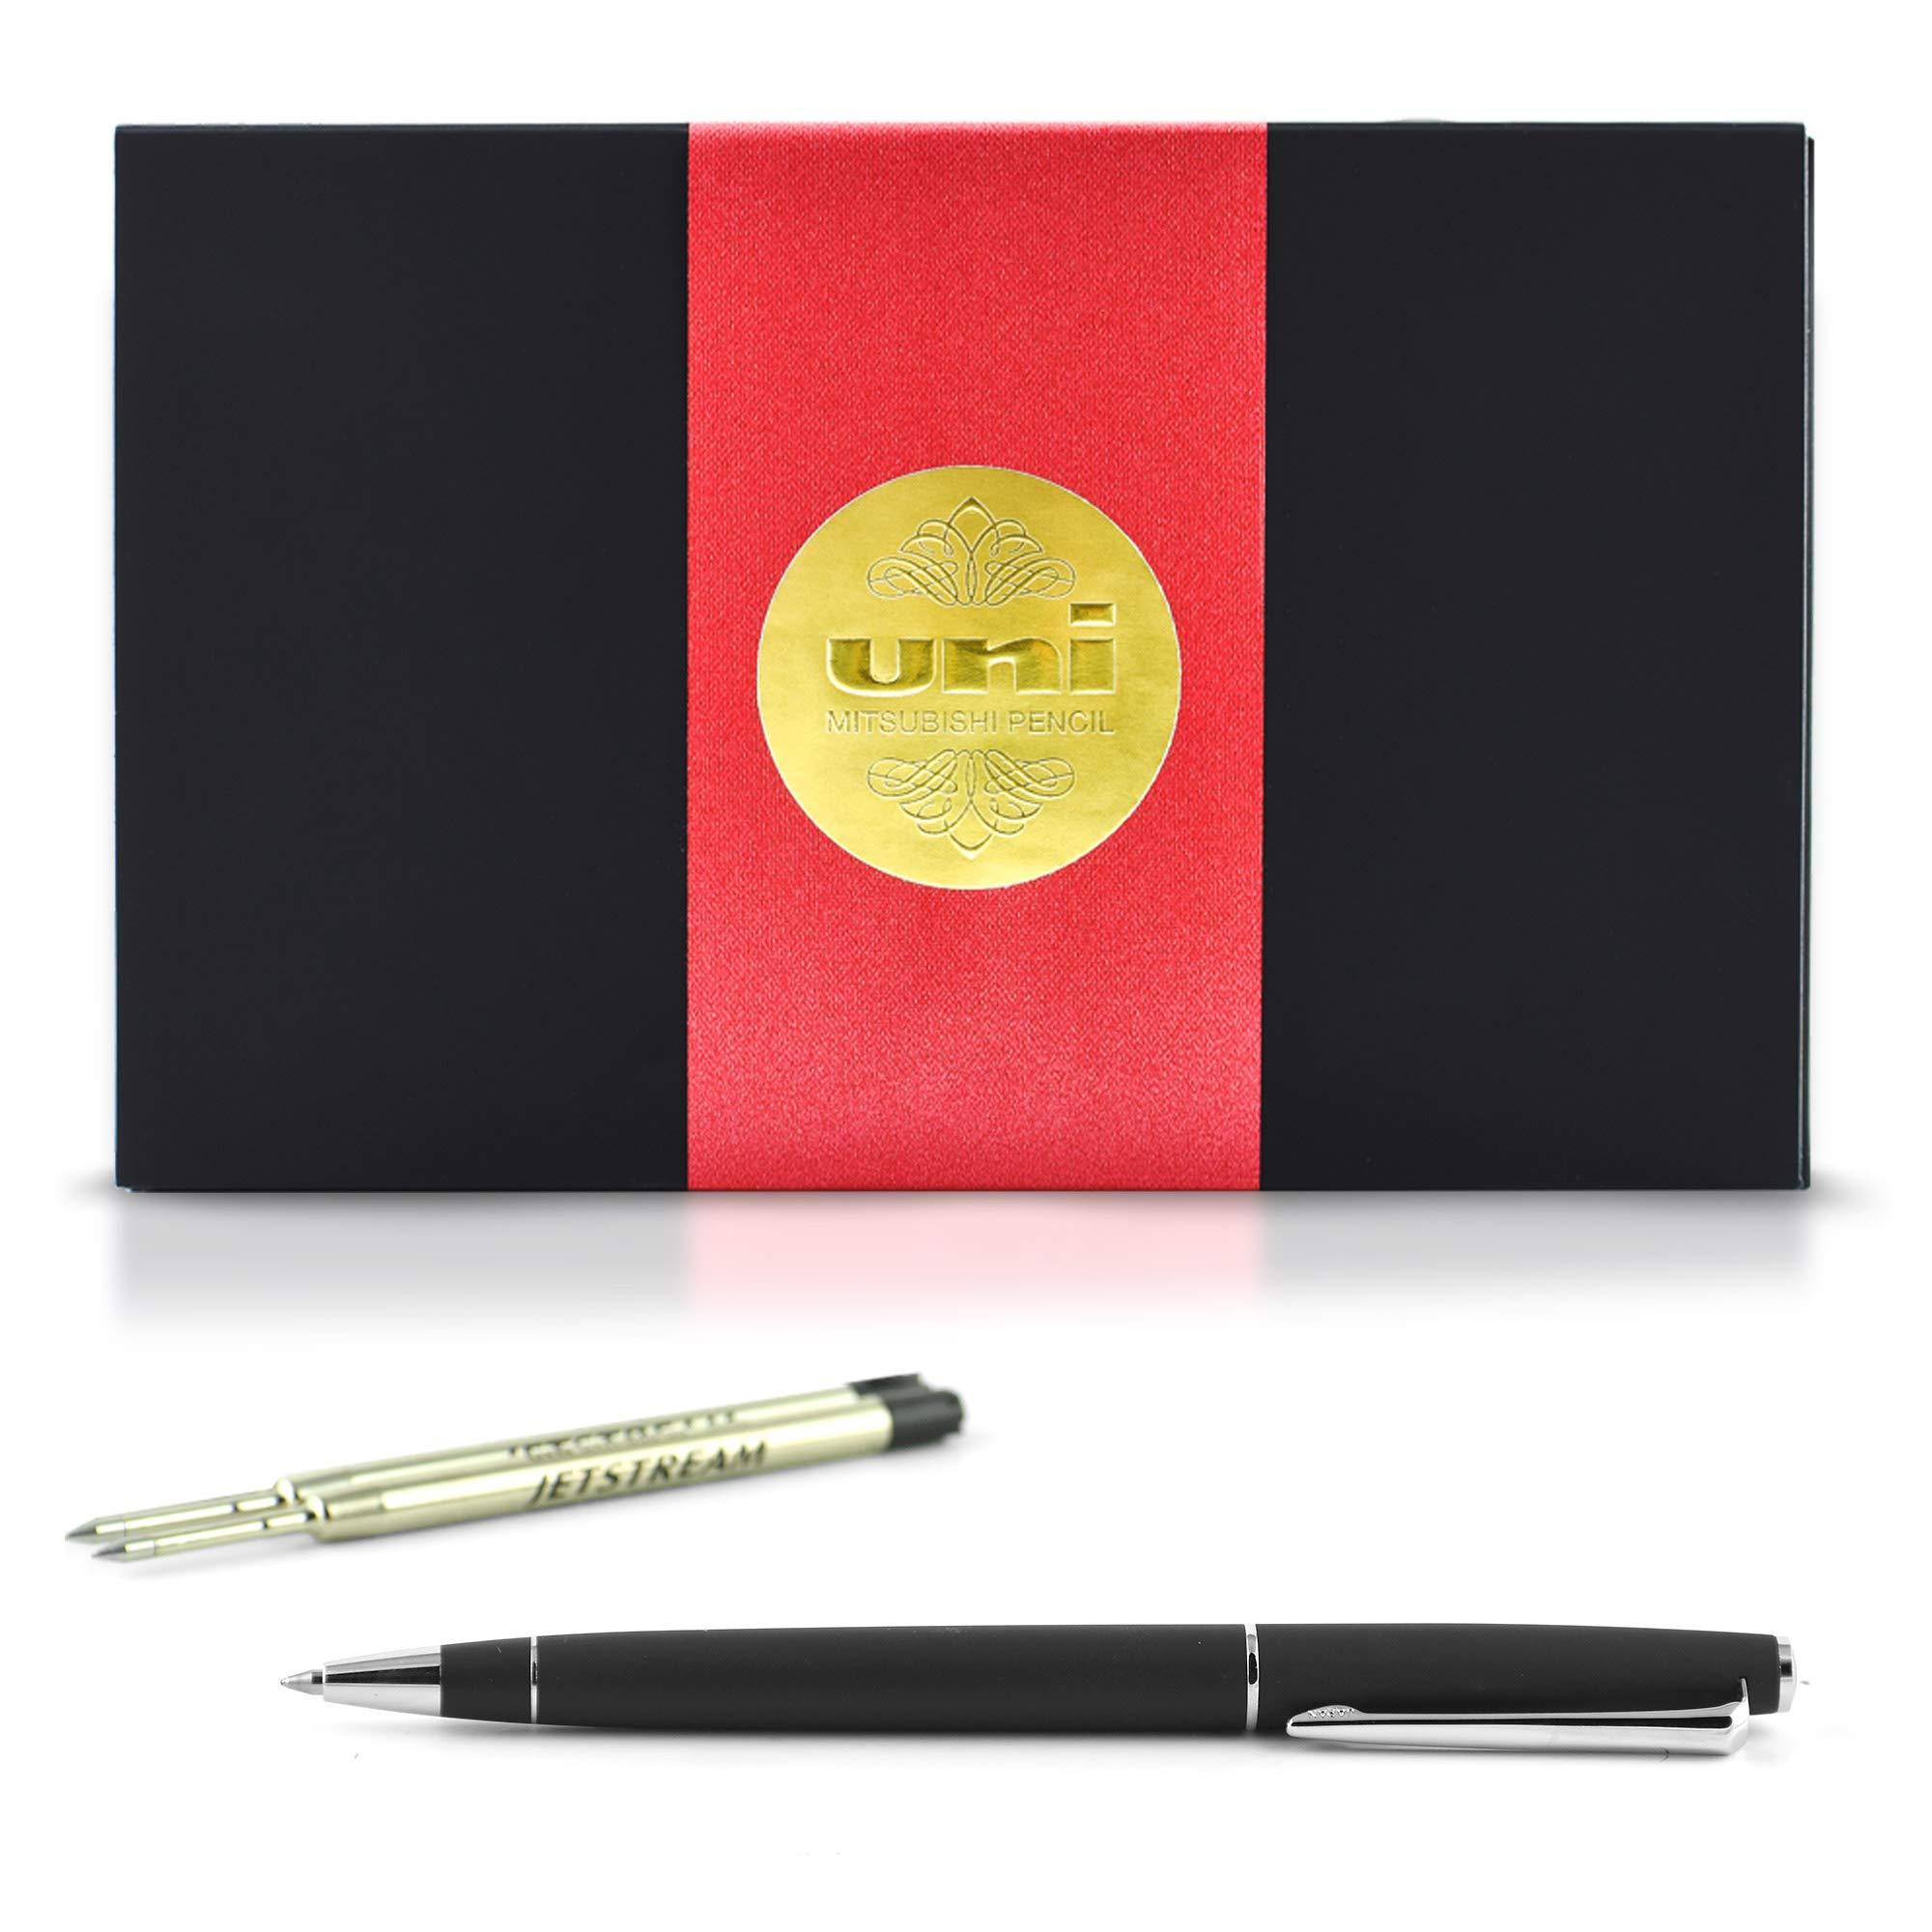 uni JETSTREAM PRIME TWIST - Includes one pen + two Parker Style refills (SXR-600-07) in Exclusive uni Gift Box - Black